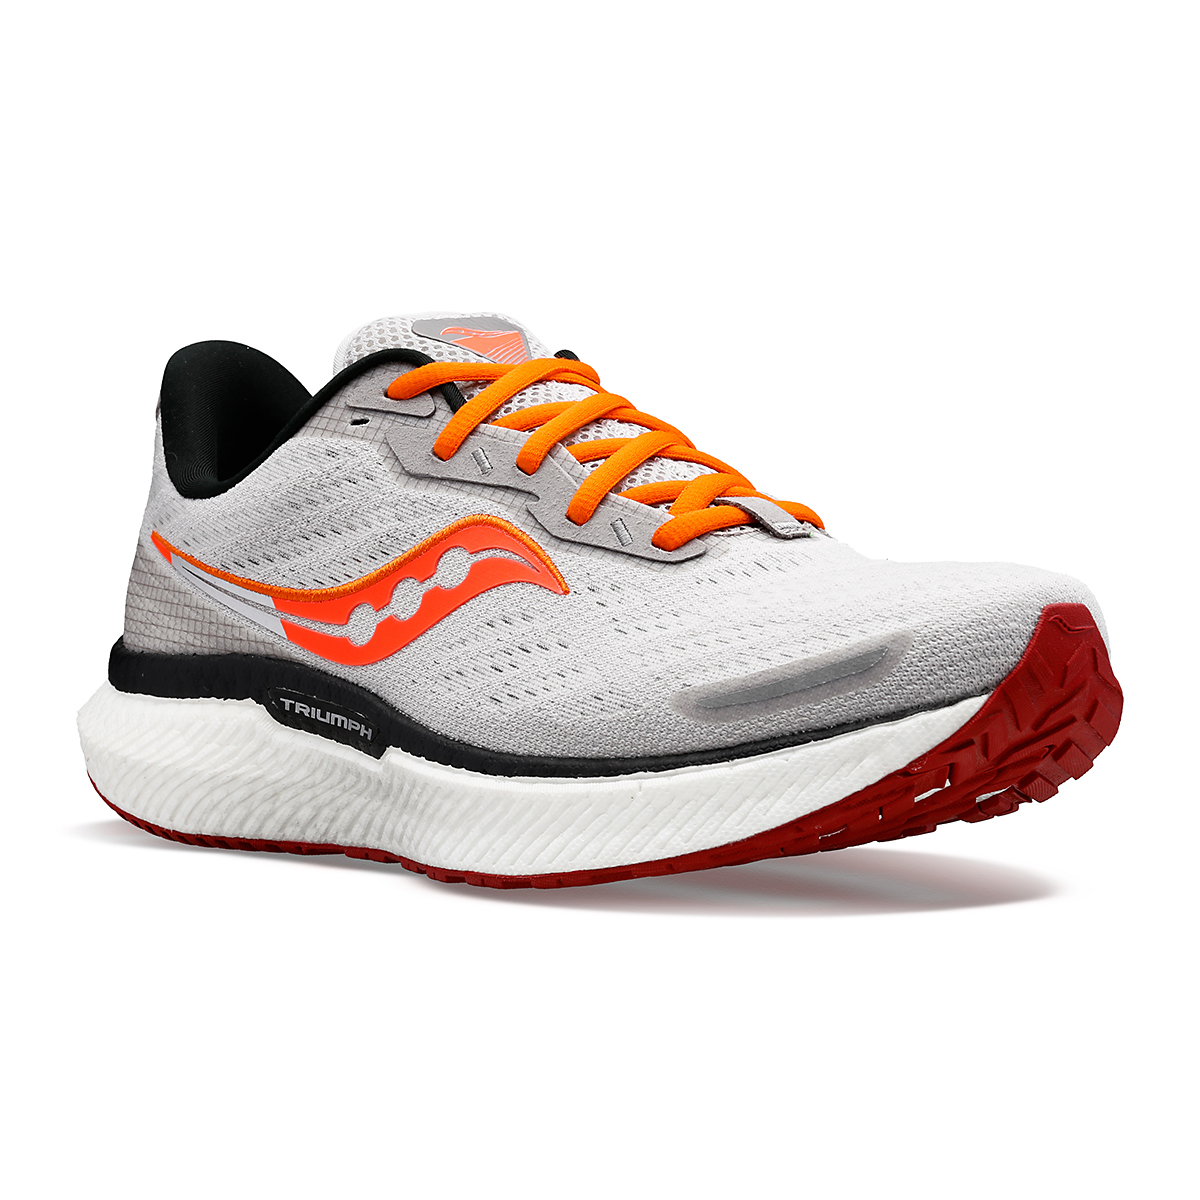 Men's Saucony Triumph 19 Running Shoe - Color: Jackalope - Size: 7 - Width: Regular, Jackalope, large, image 5